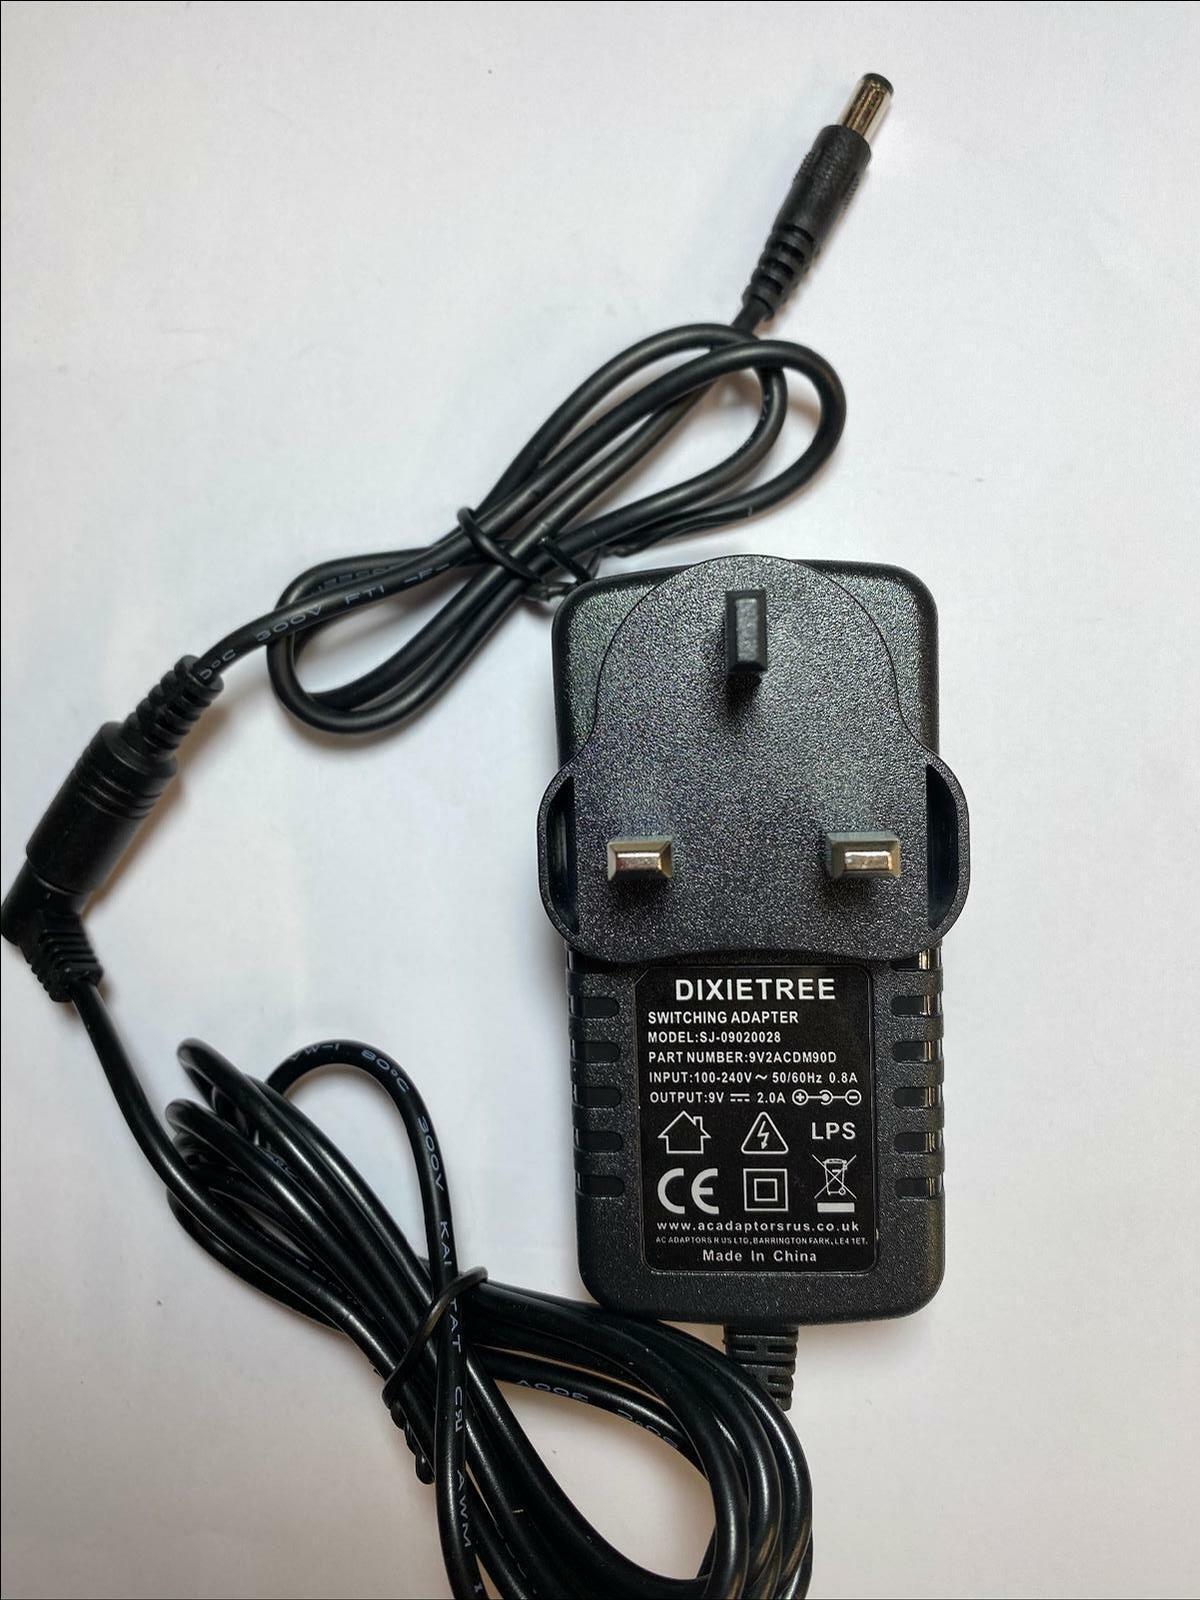 9V 9.0V 2.0A 2A 2000mA AC-DC Switching Adaptor Power Supply Negative Centre UK